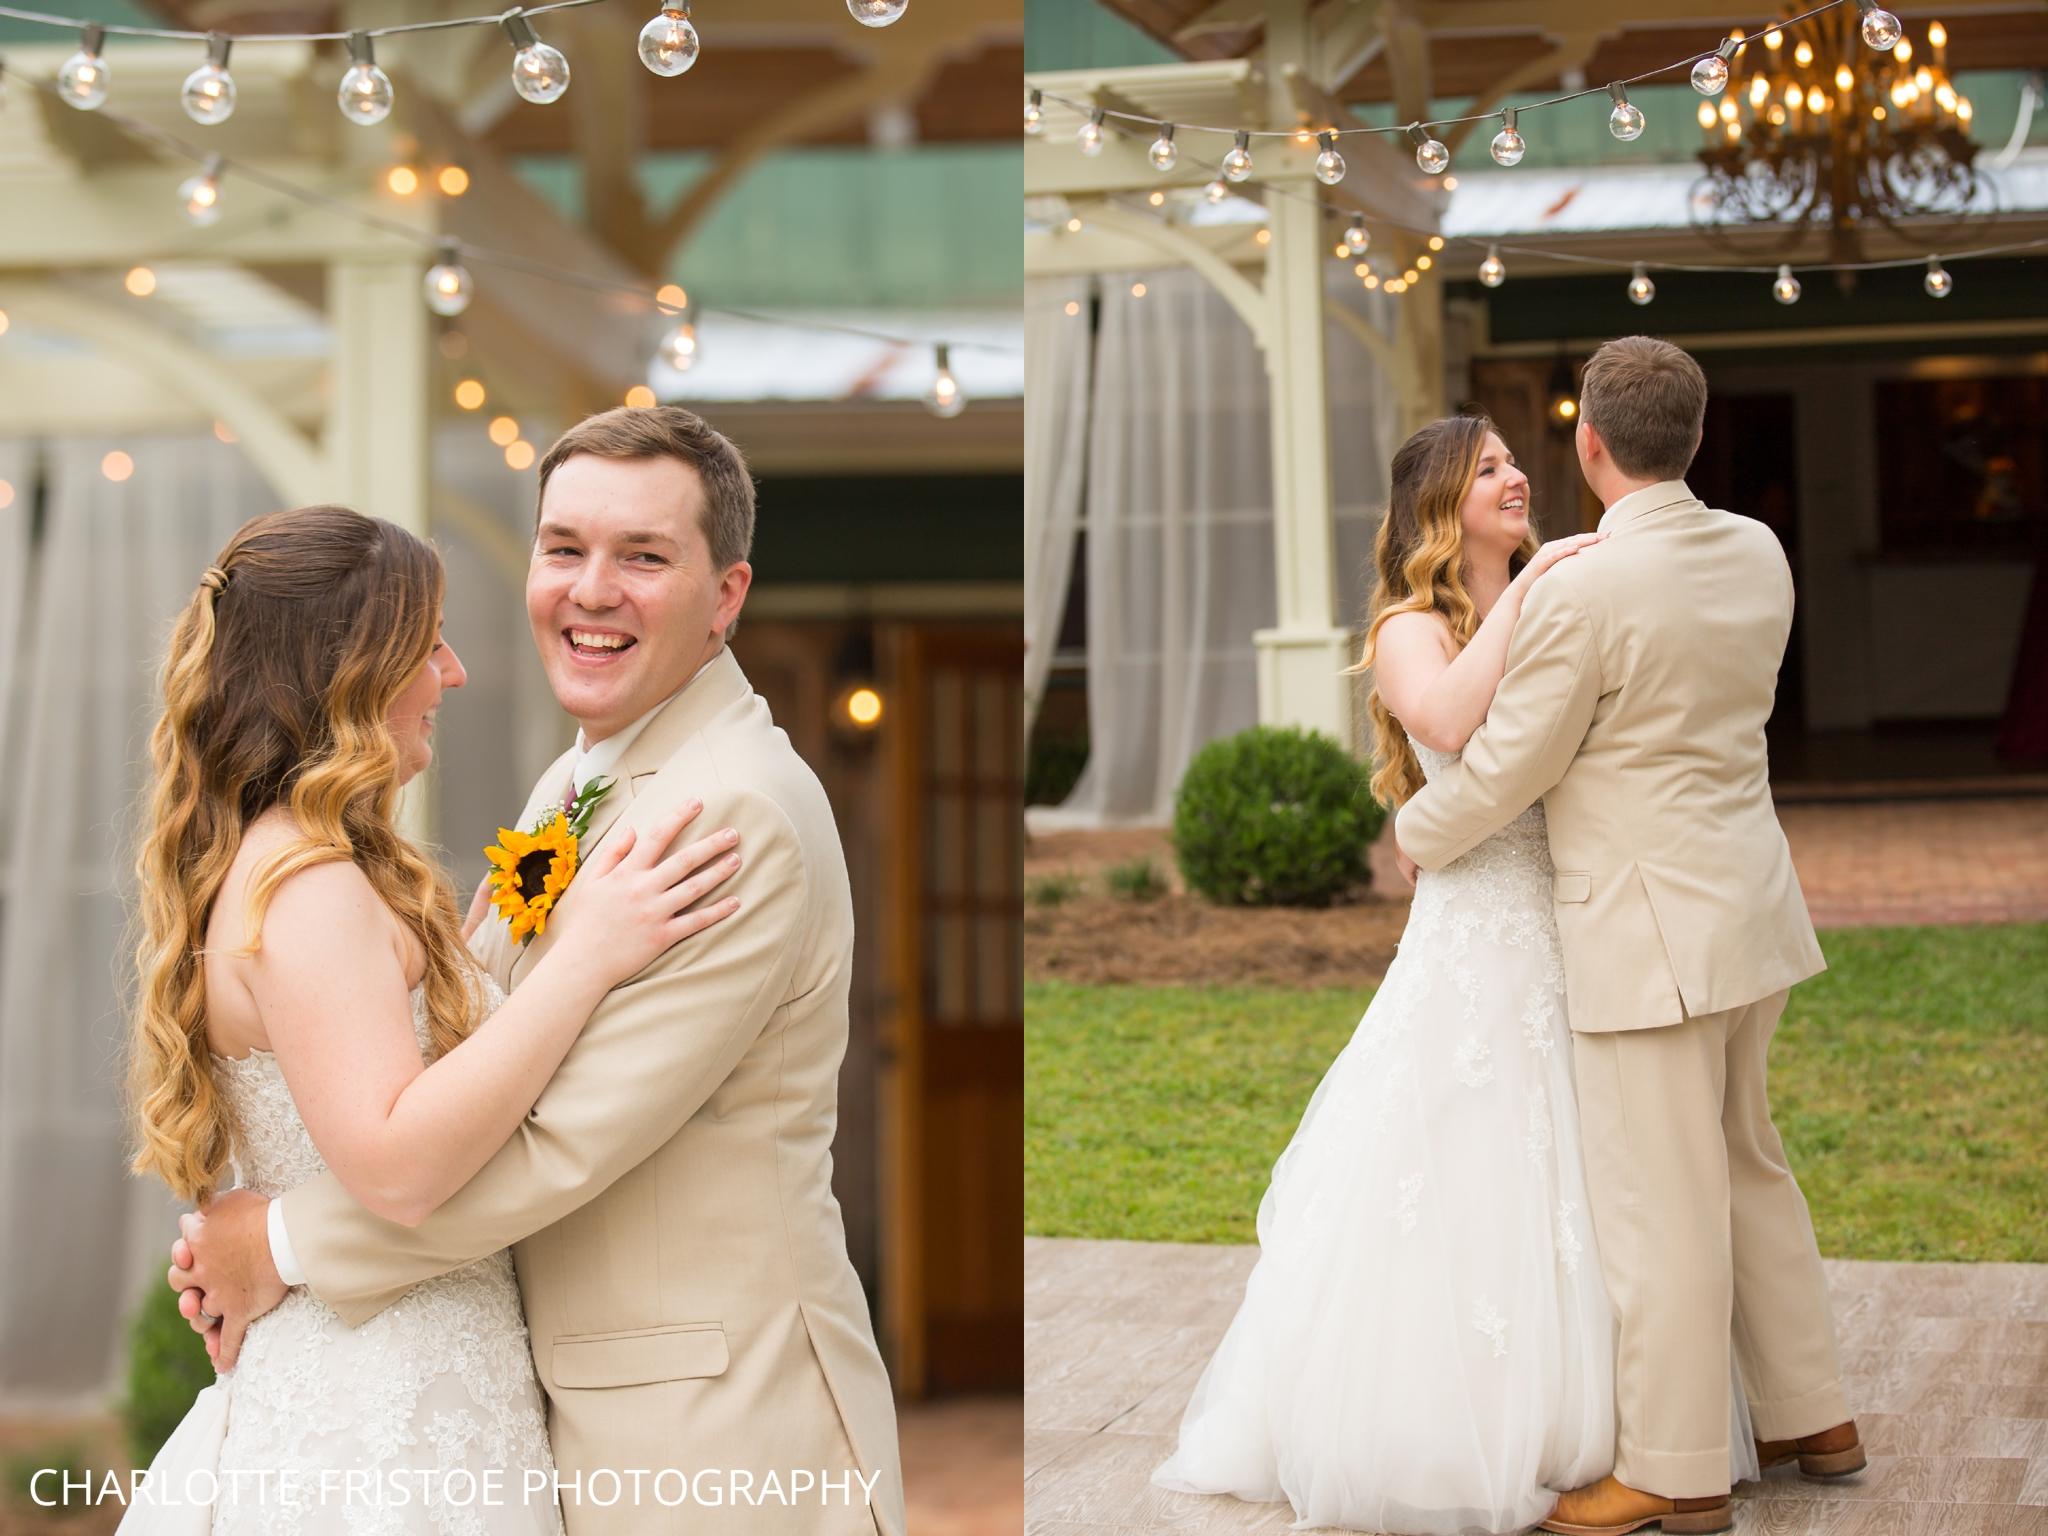 Tallahassee_Wedding_Charlotte_Fristoe-68.jpg